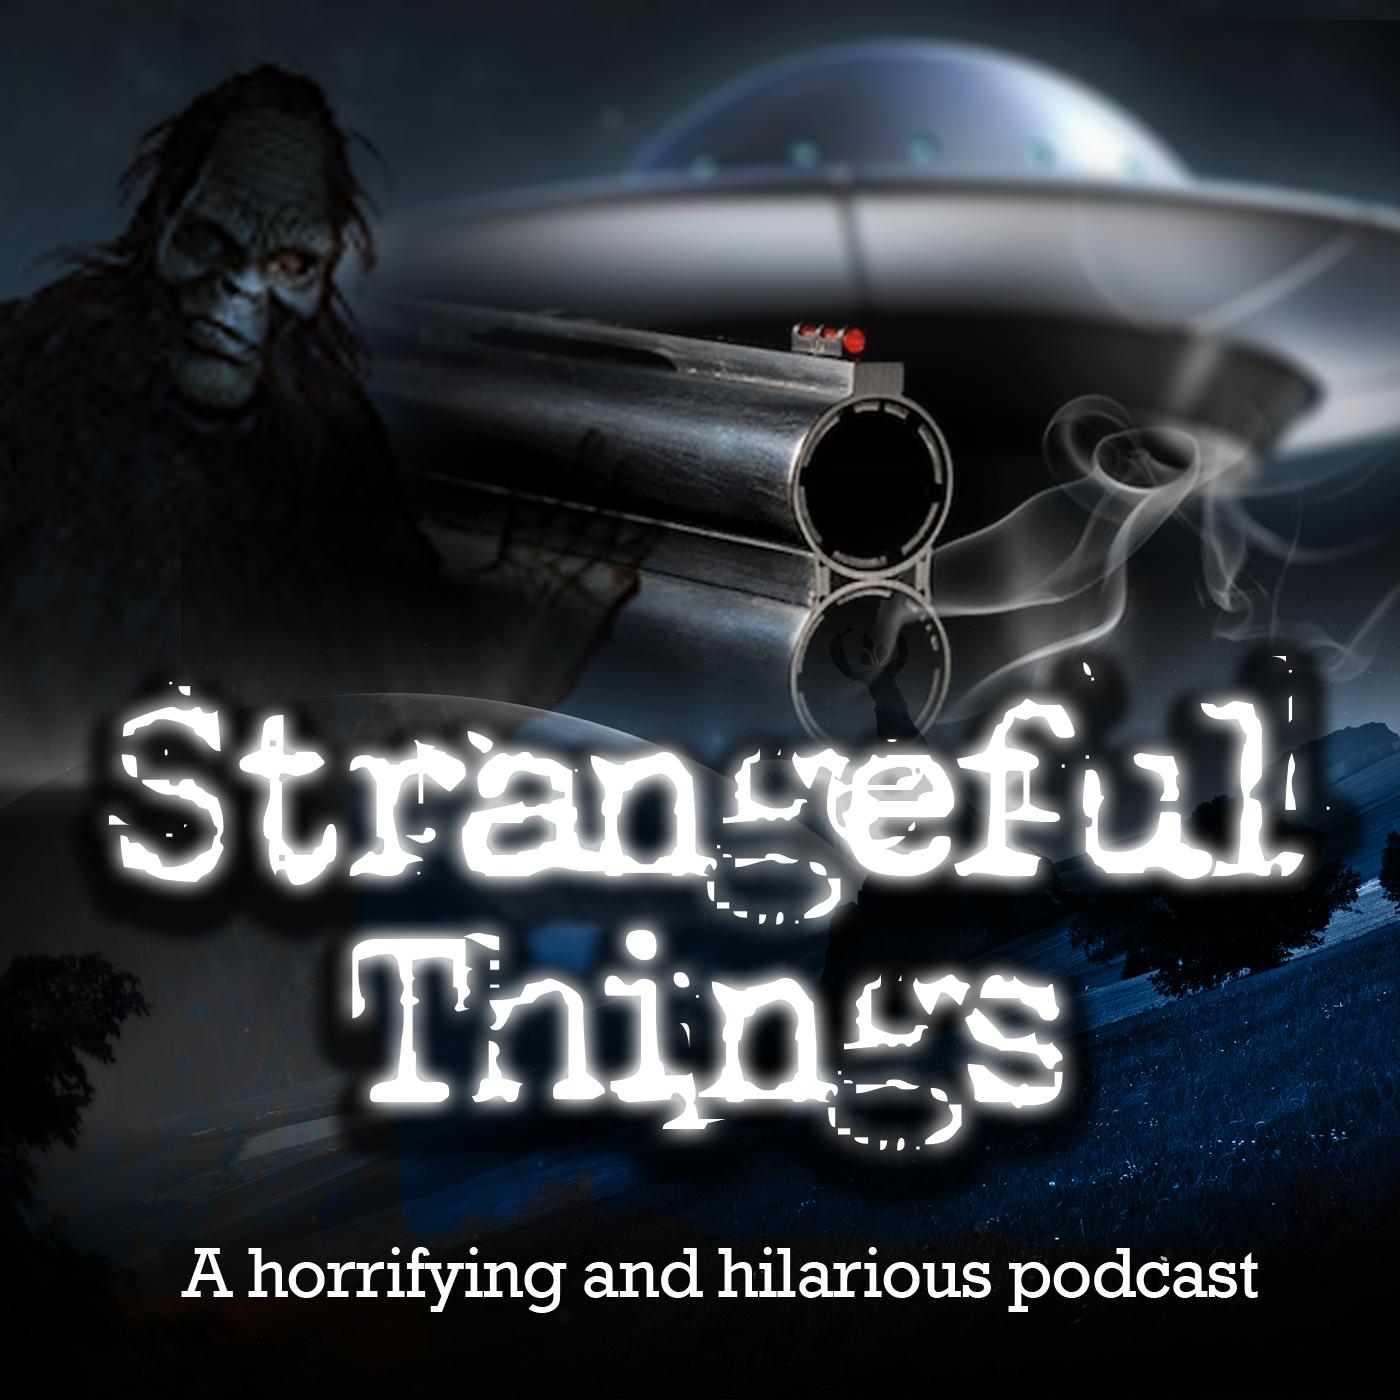 Strangeful Things